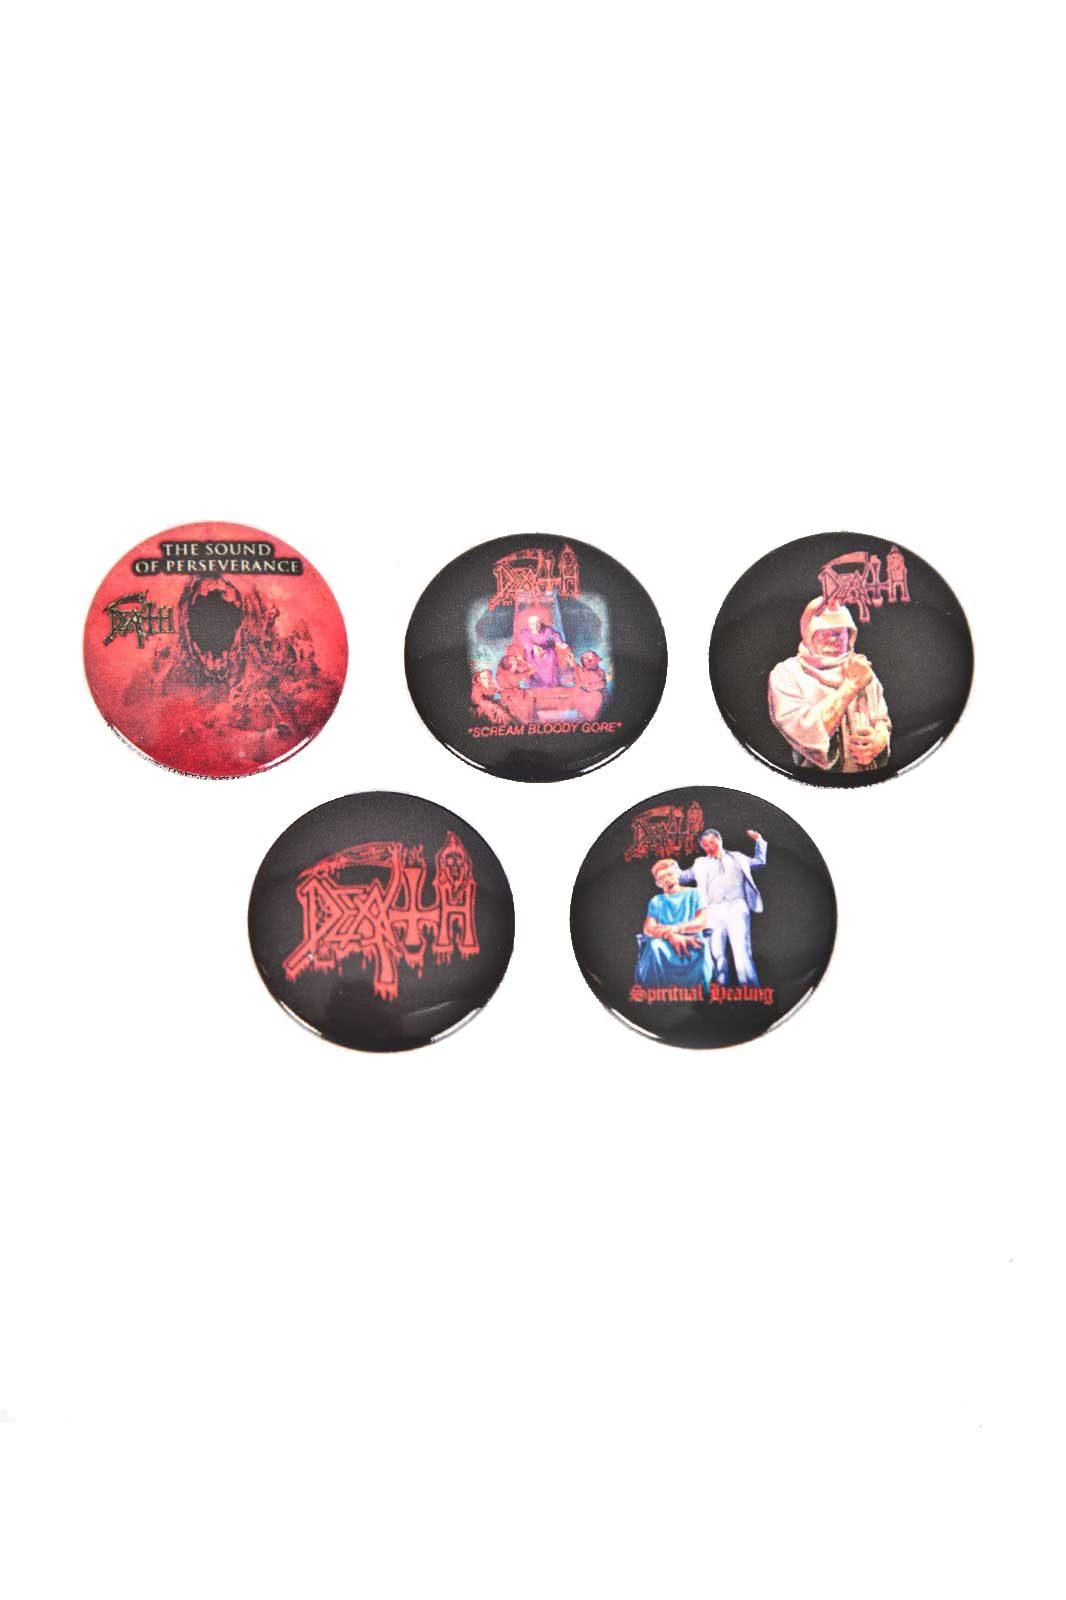 official merchandise death badge 5-pack